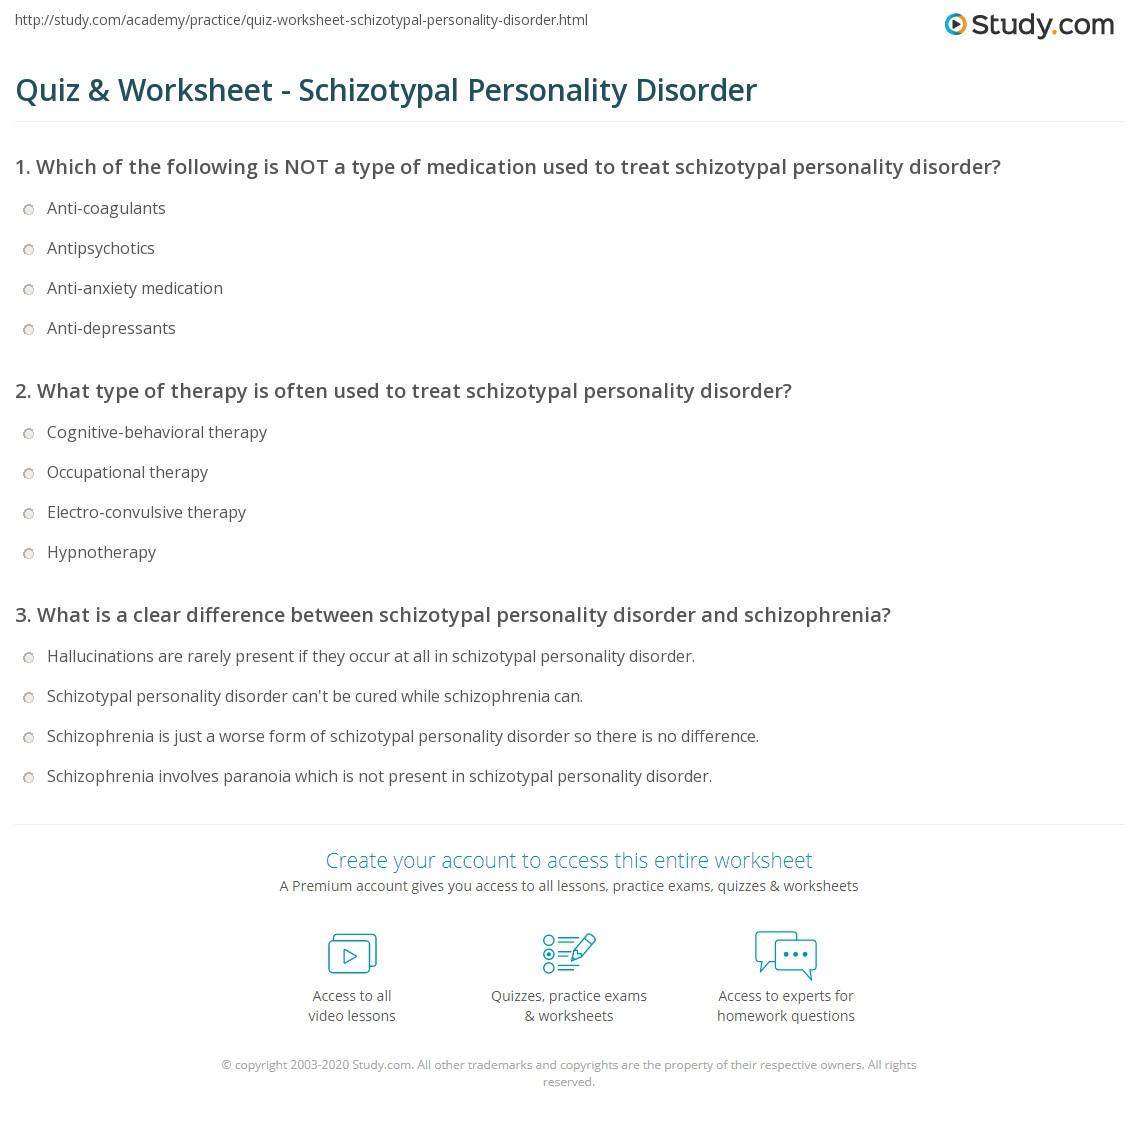 Quiz & Worksheet - Schizotypal Personality Disorder   Study com